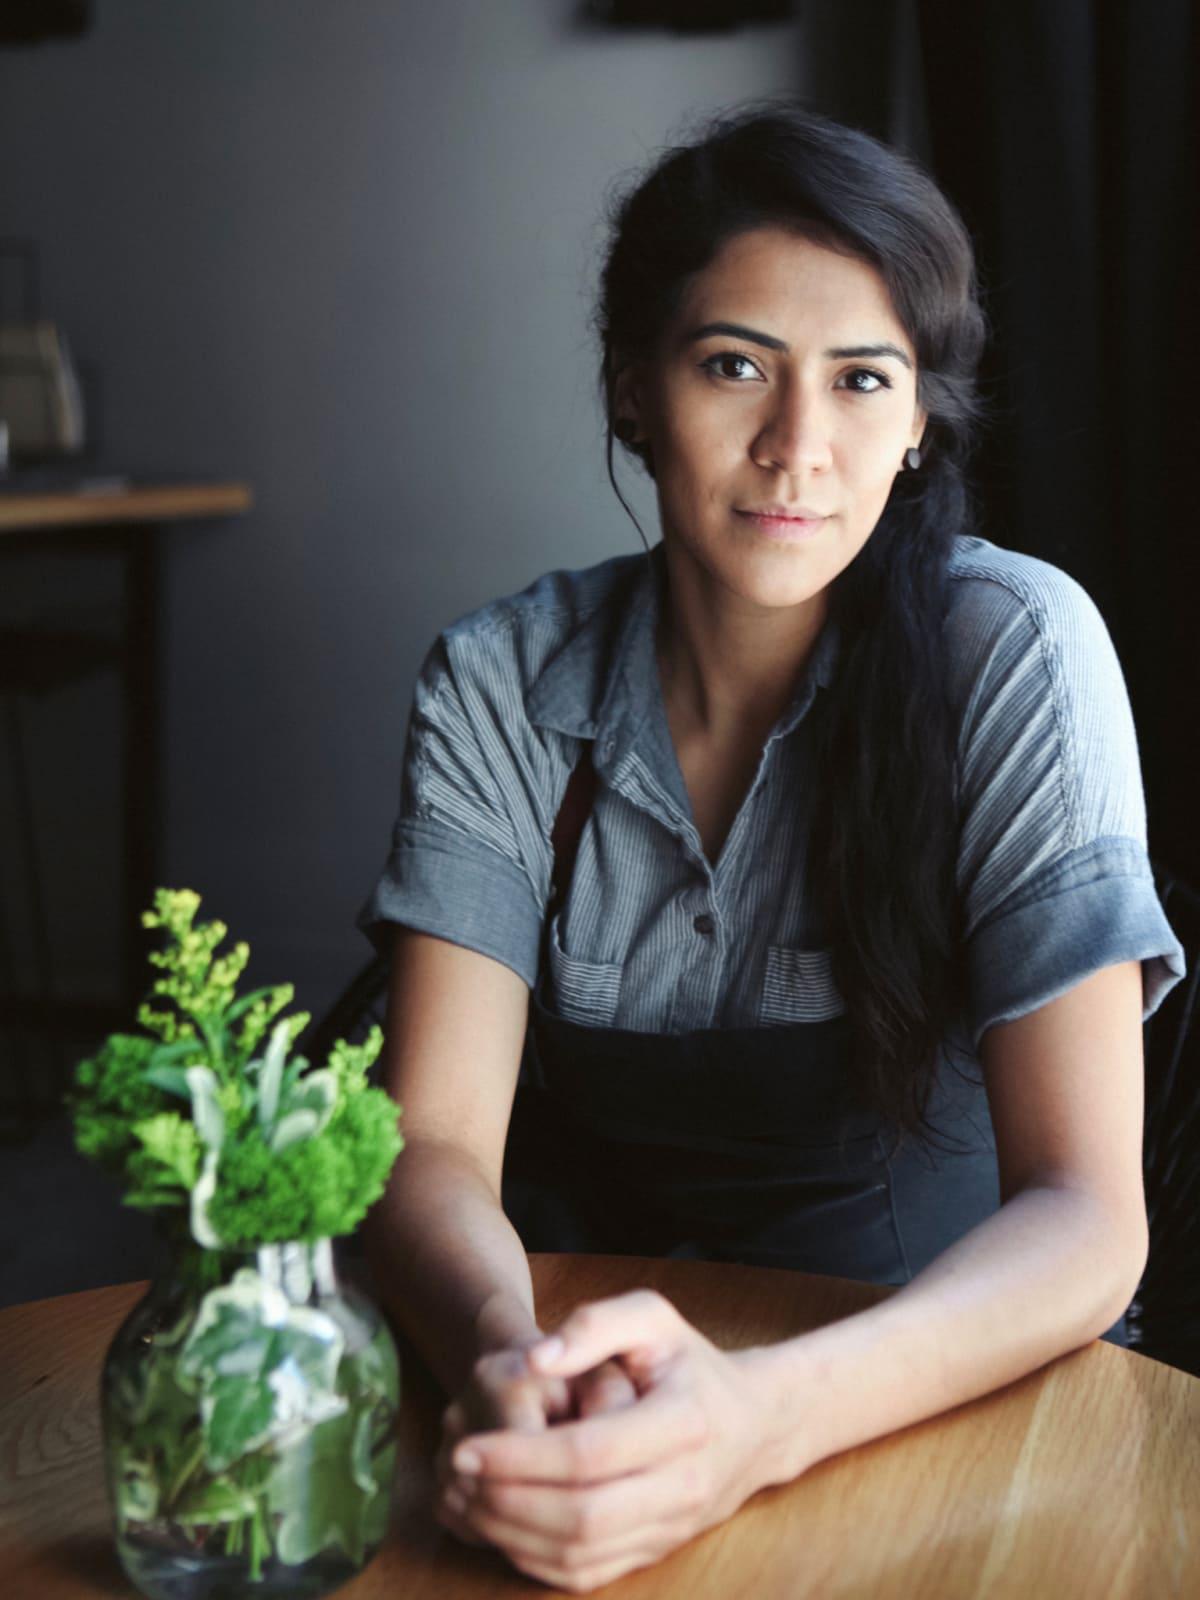 Daniela Soto-Innes Cosme